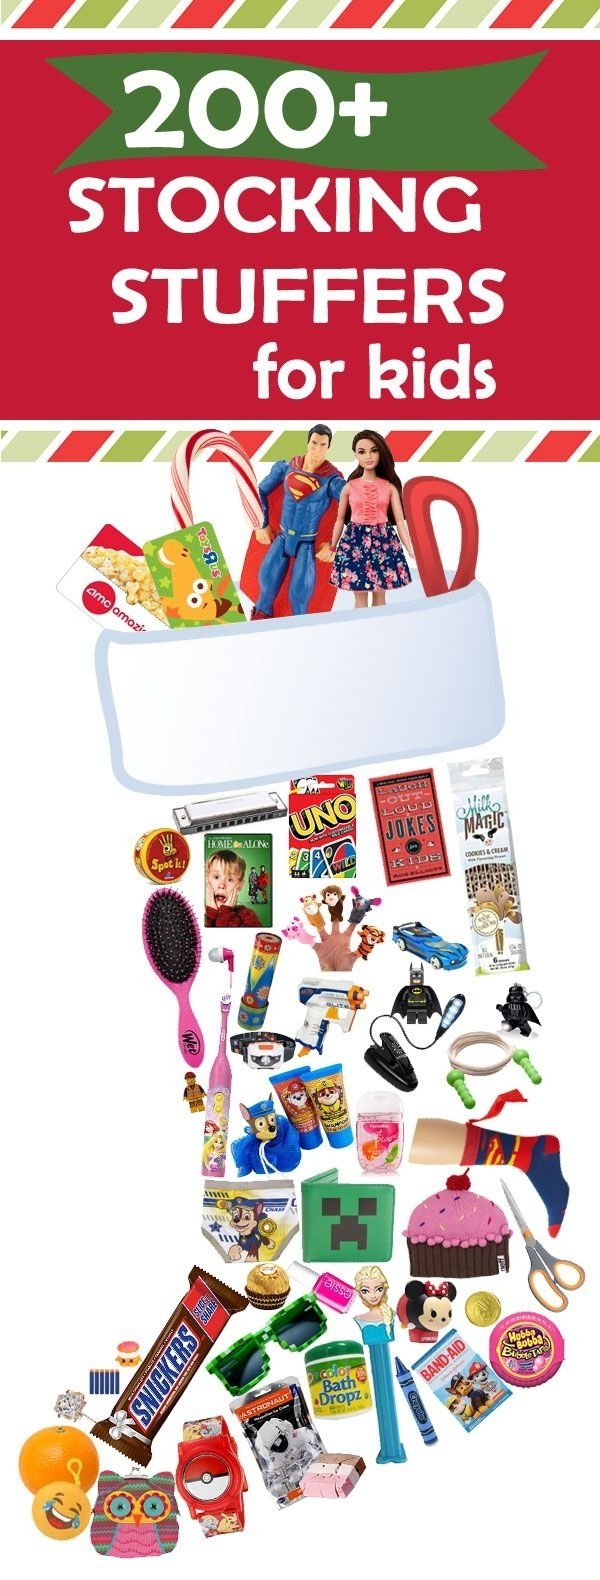 10 Nice Christmas Stocking Ideas For Kids ultimate stocking stuffers list 101 ideas for kids stocking 2020